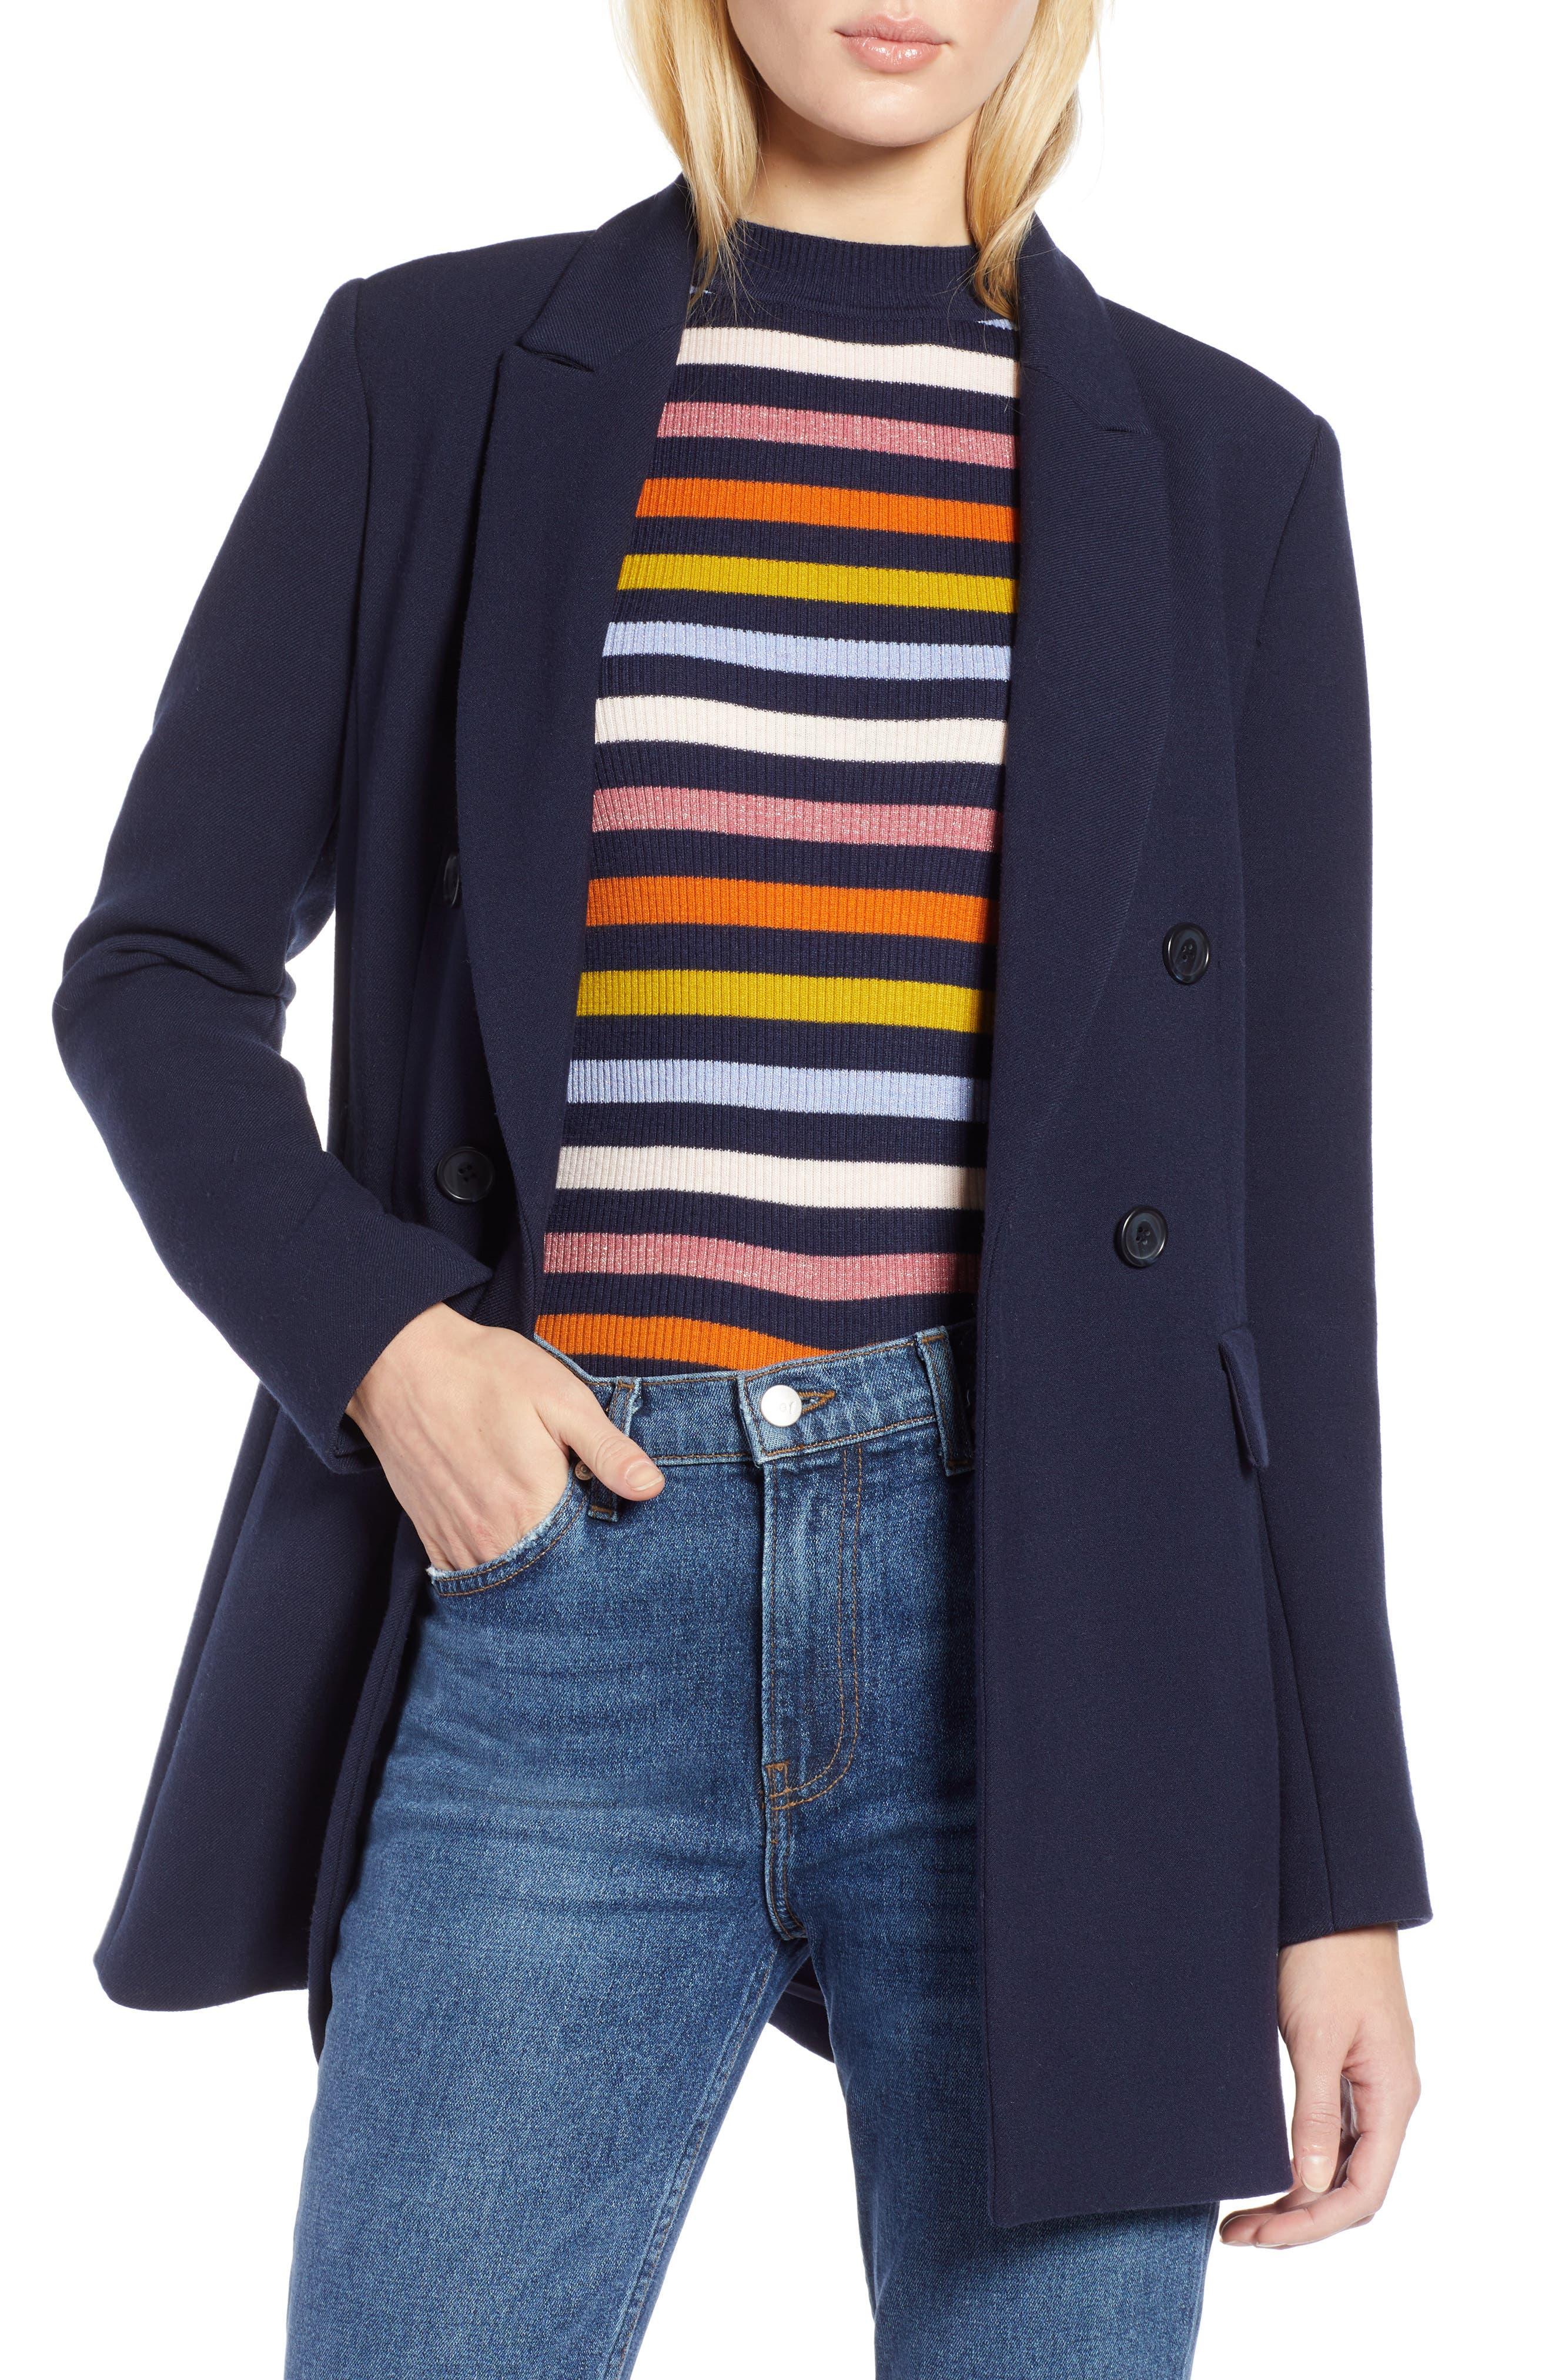 x Atlantic-Pacific Menswear Double Breasted Blazer,                             Main thumbnail 1, color,                             NAVY